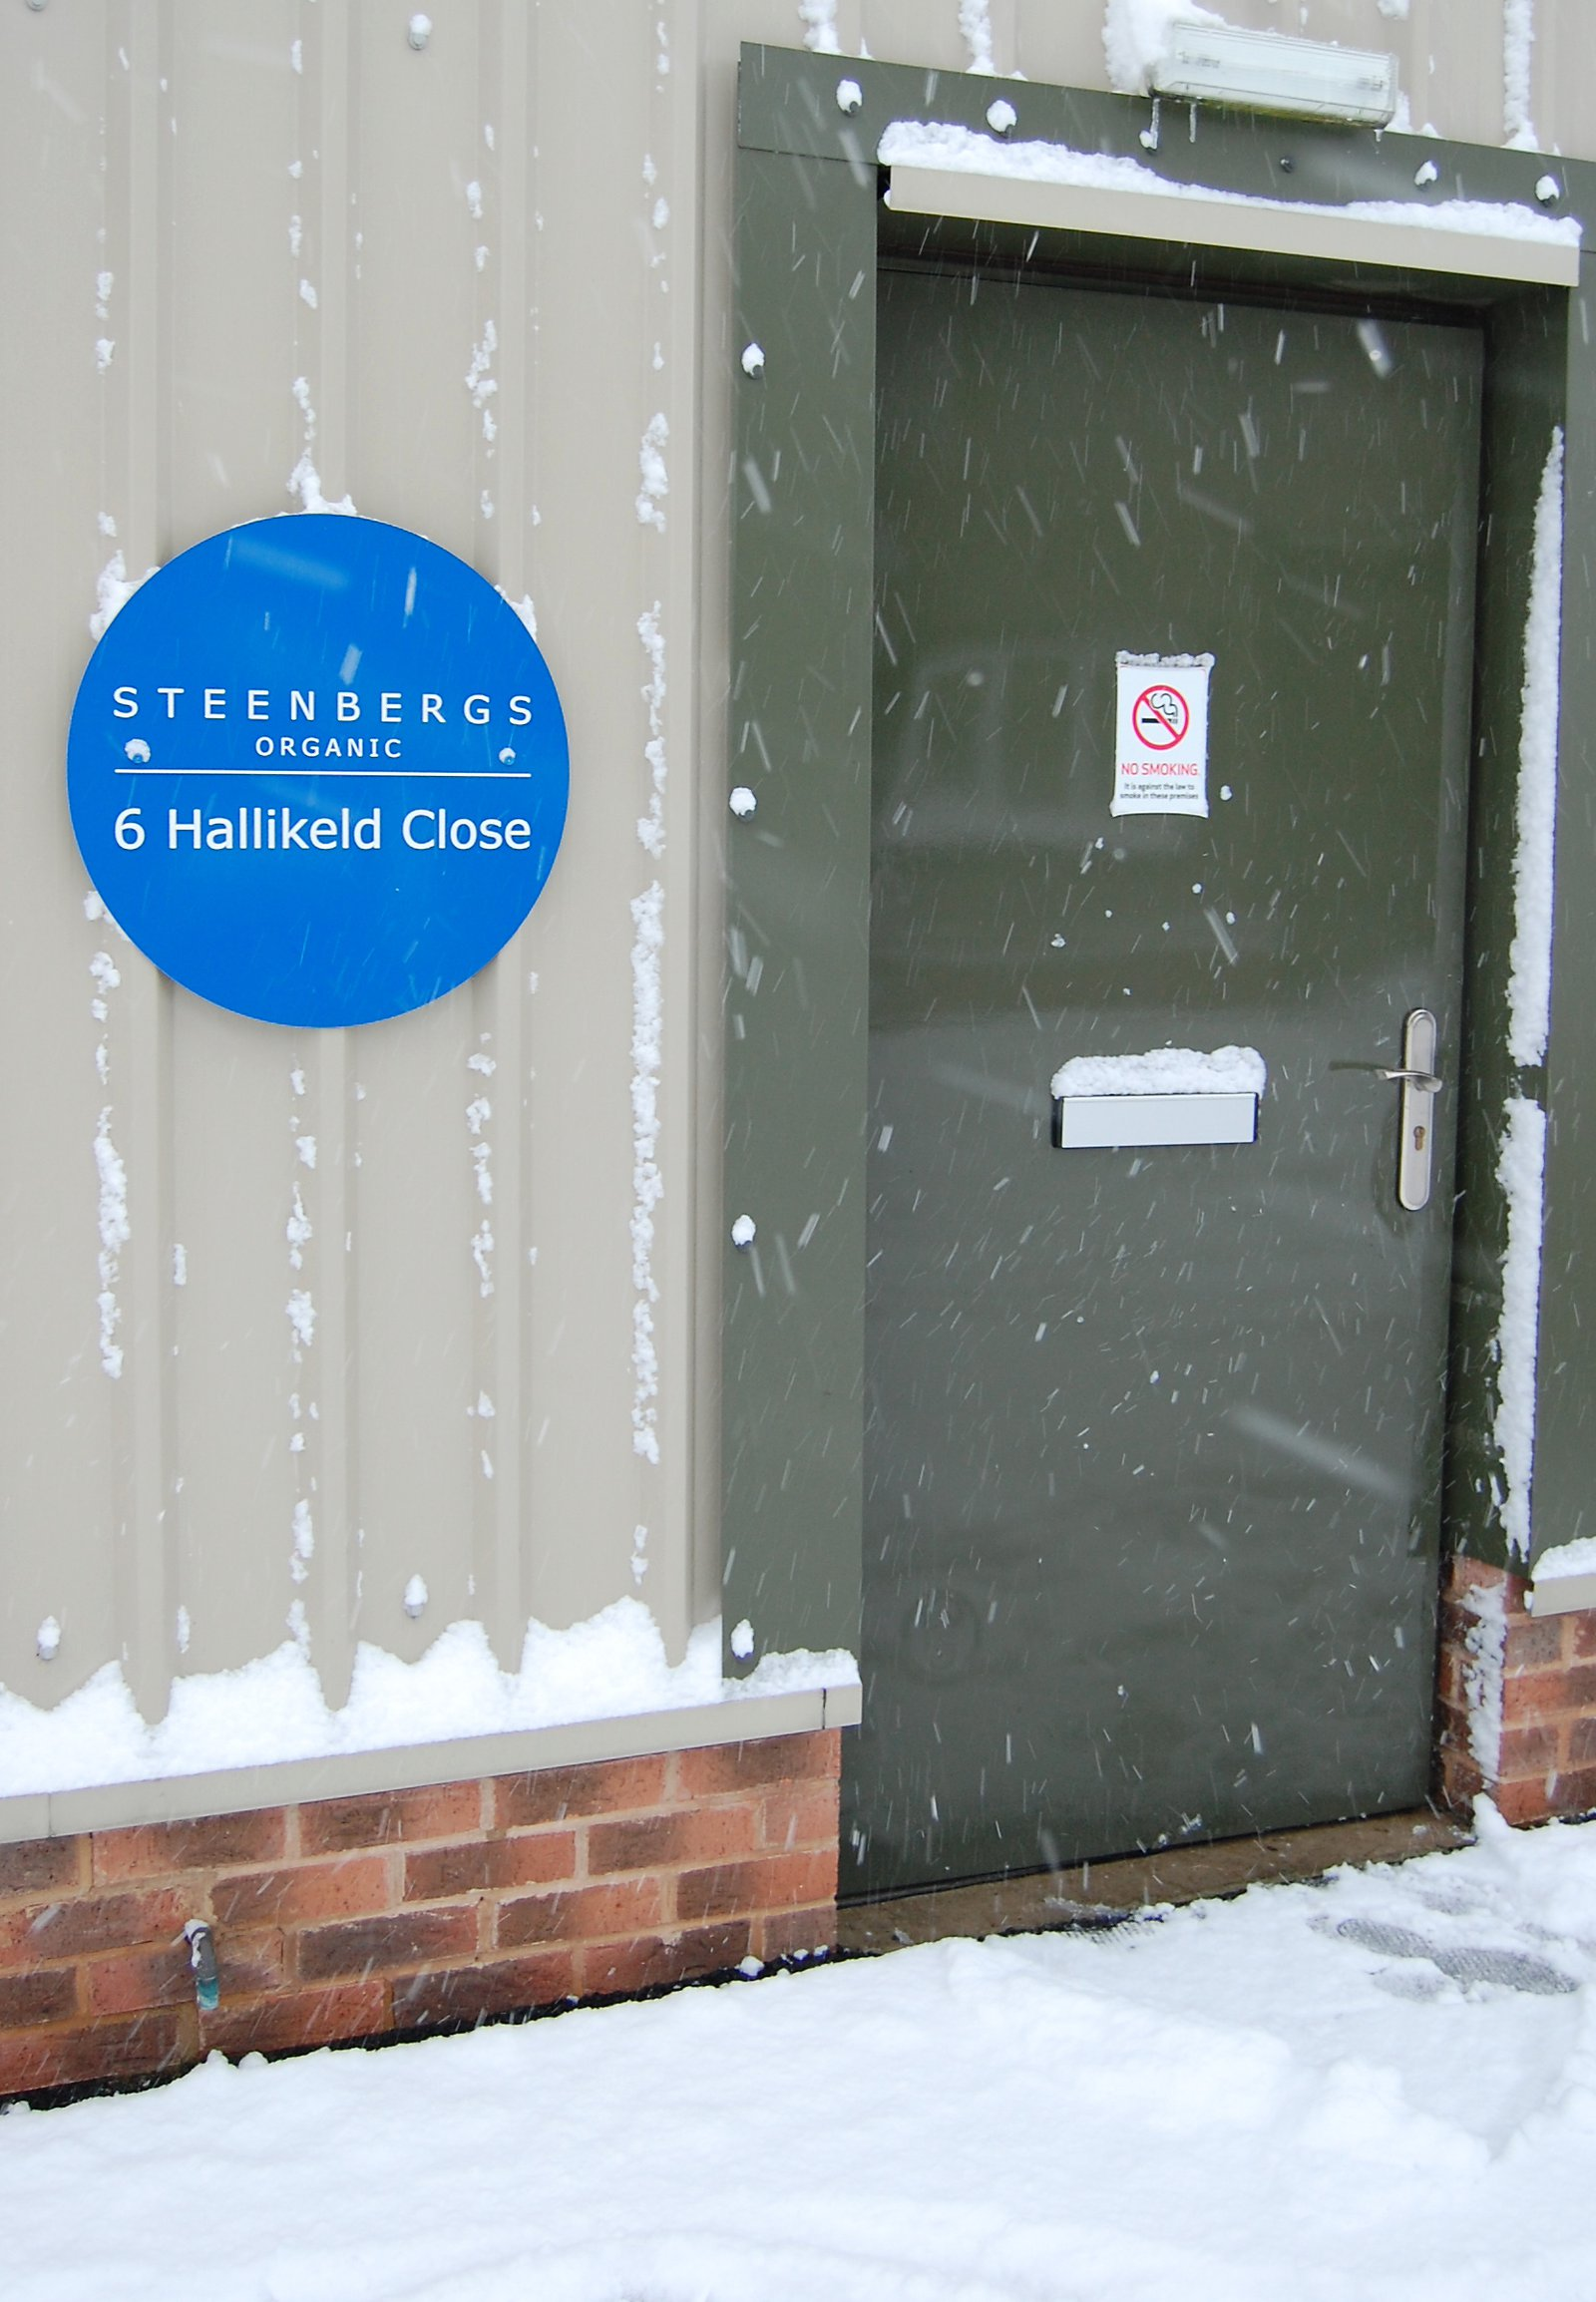 Snowy days at Steenbergs Organic